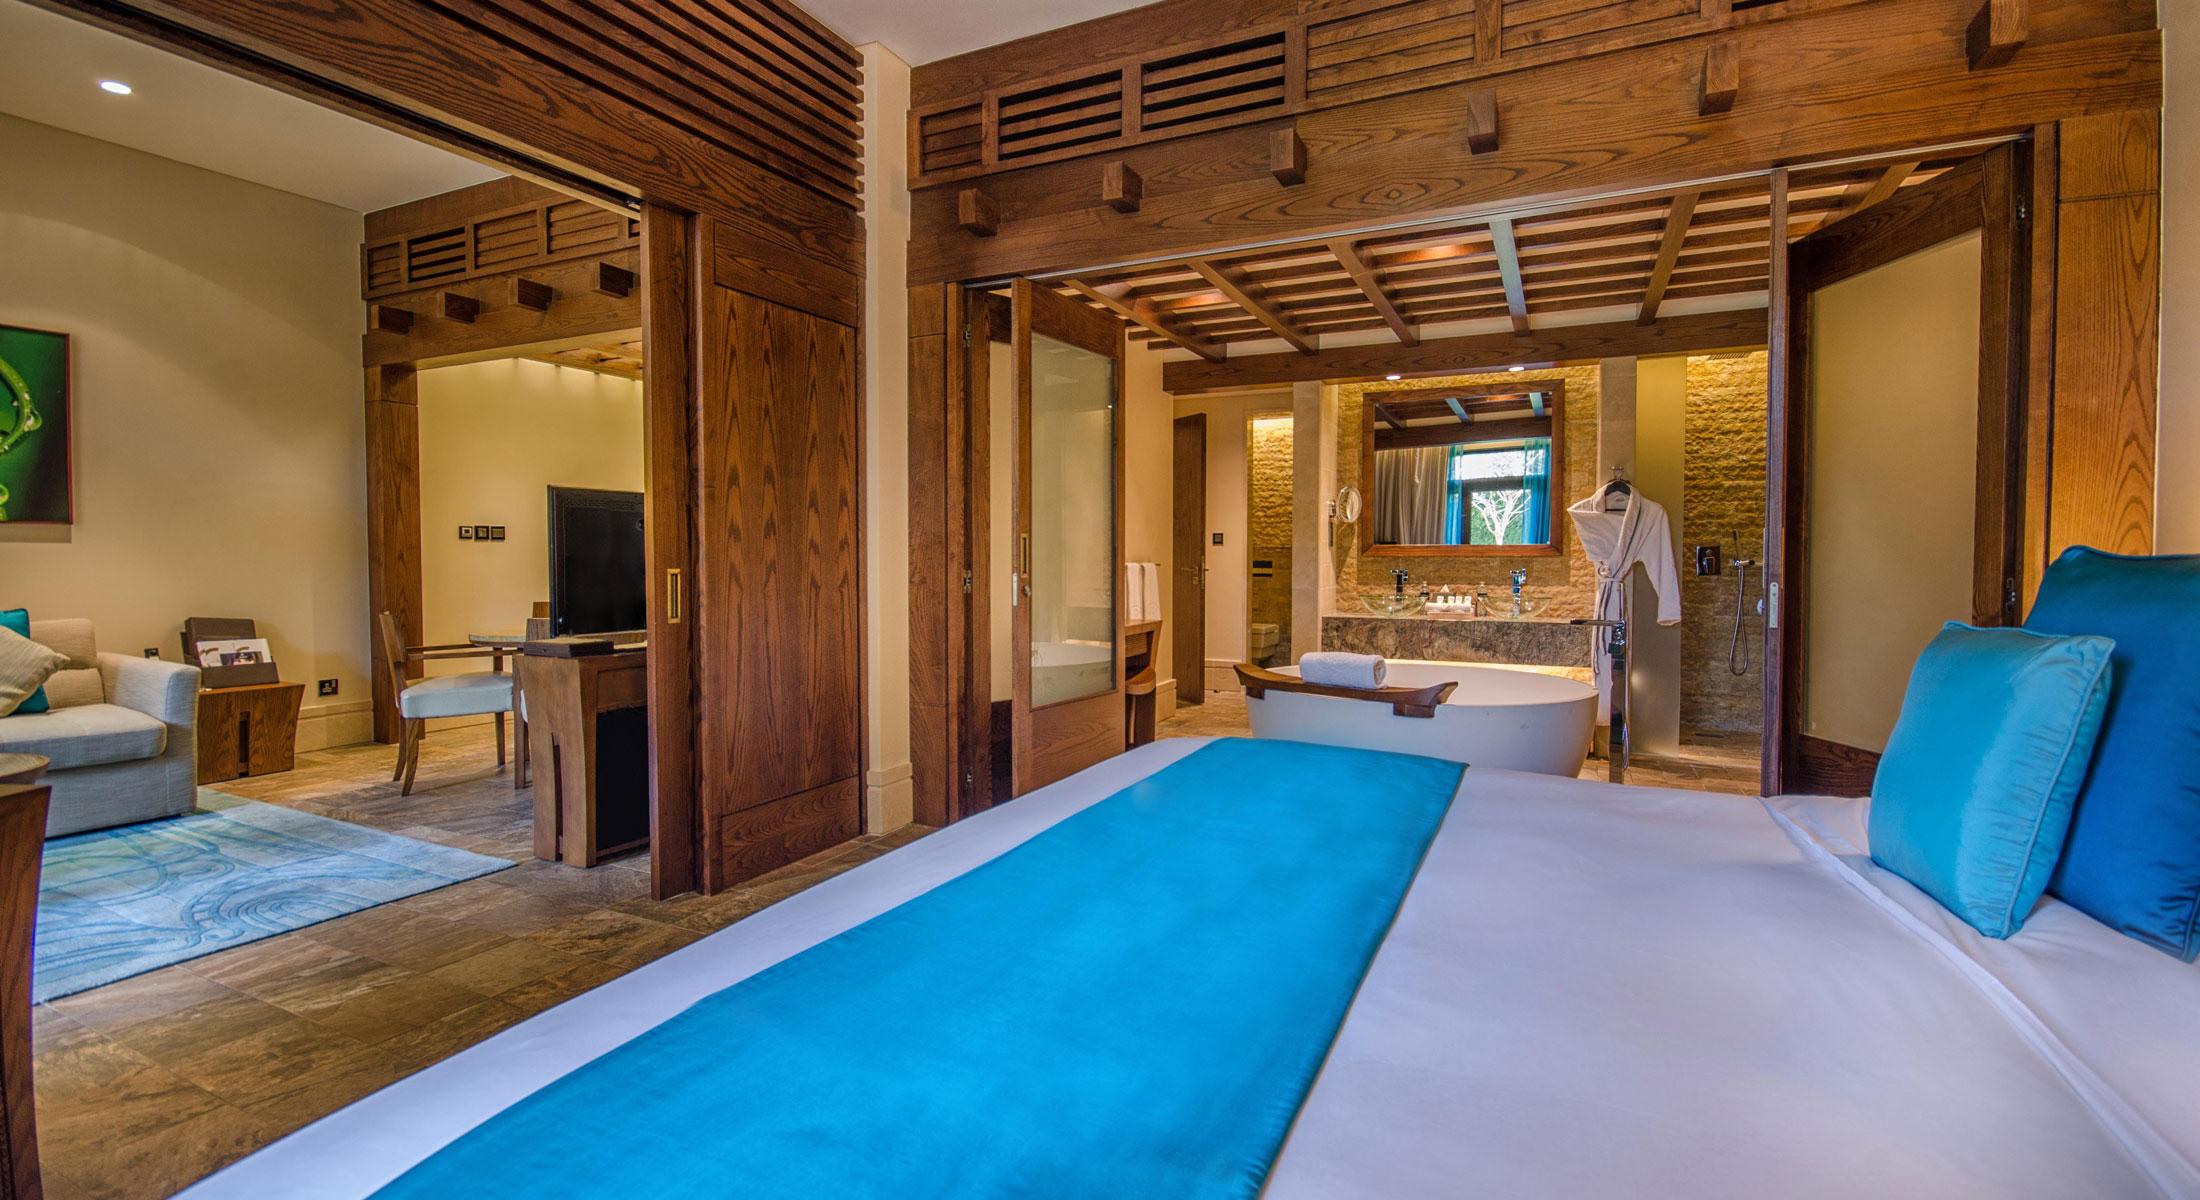 Awe Inspiring 1 Bedroom Apartment Sofitel Dubai The Palm Resort Spa Interior Design Ideas Gentotthenellocom